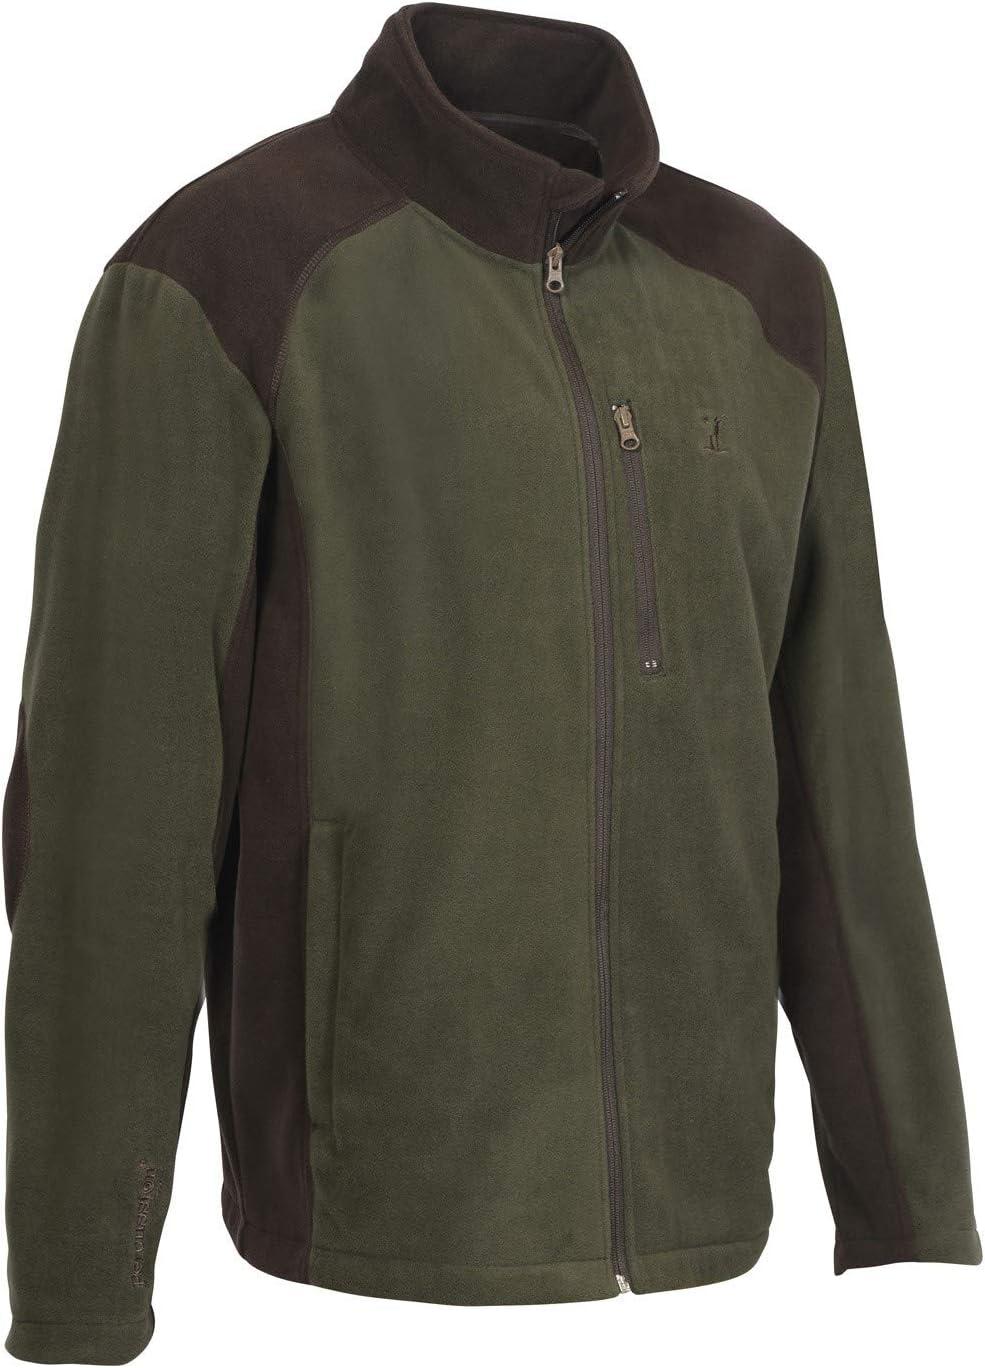 Percussion Cor Embroidered Logo Fleece Jacket